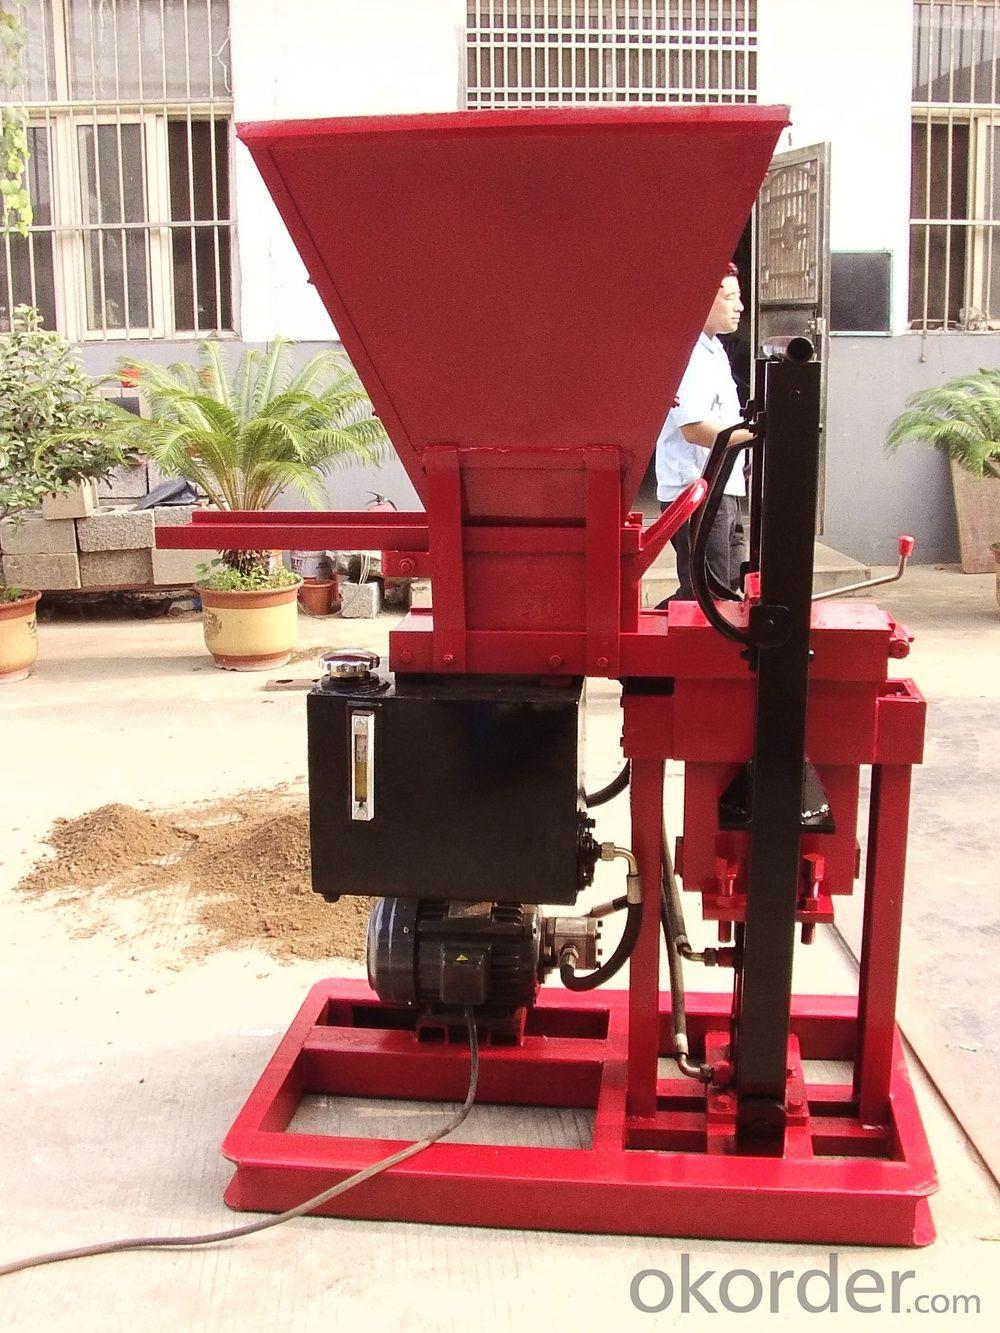 SL1-25 Hydraulic Semi-Automatic Brick Making Machine Using Soil /Clay  Material